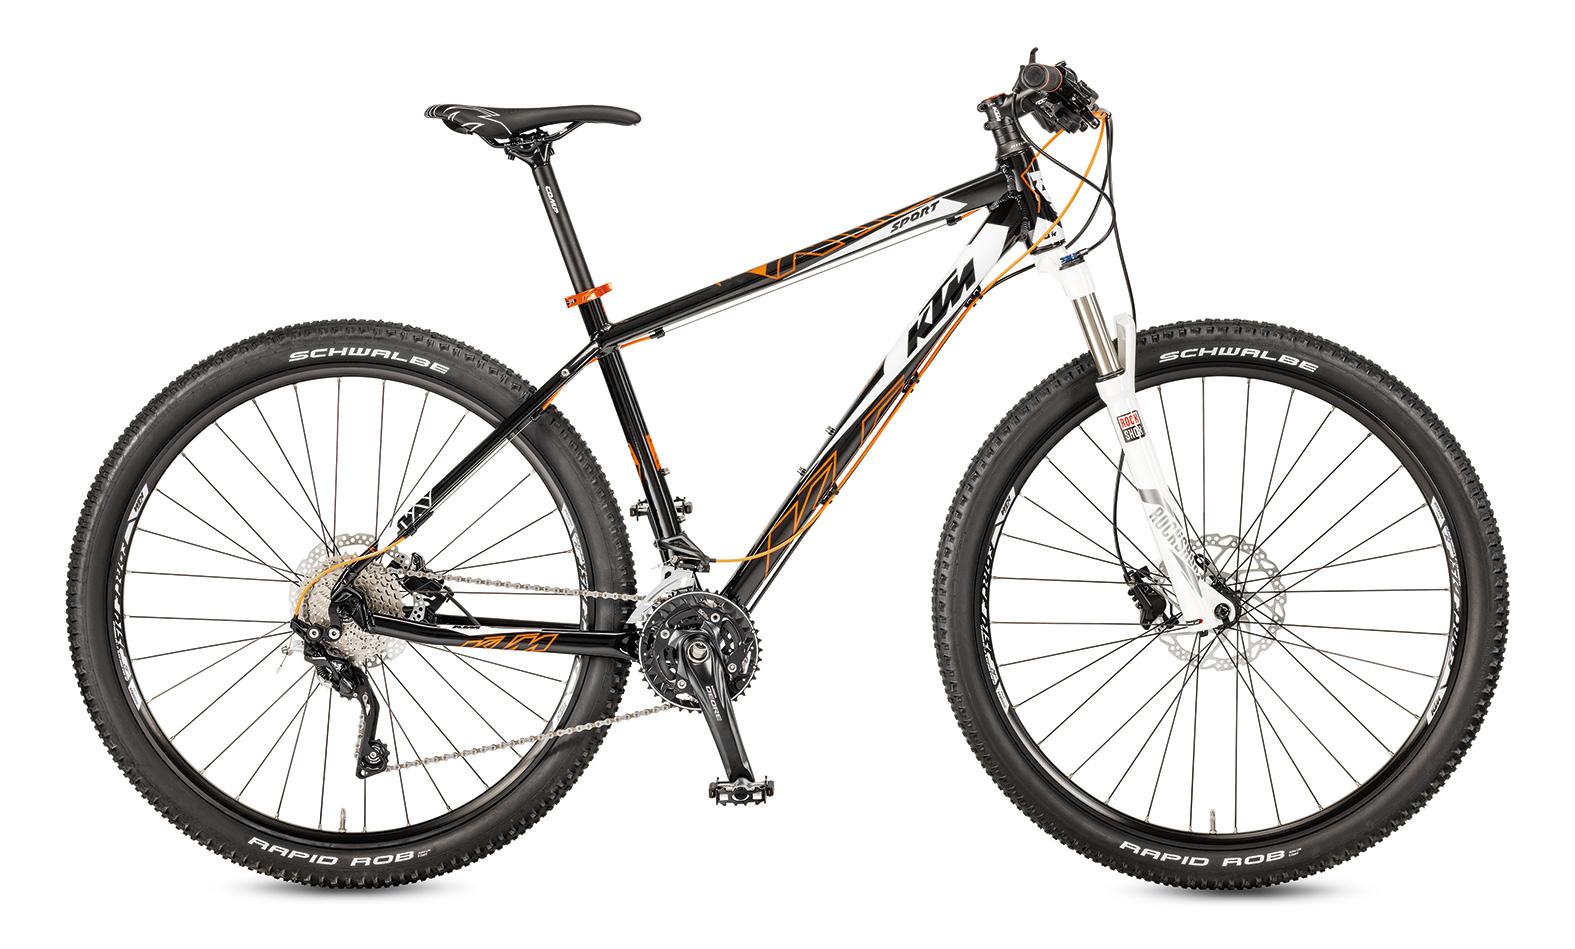 Ktm Mtb Bikes Prices